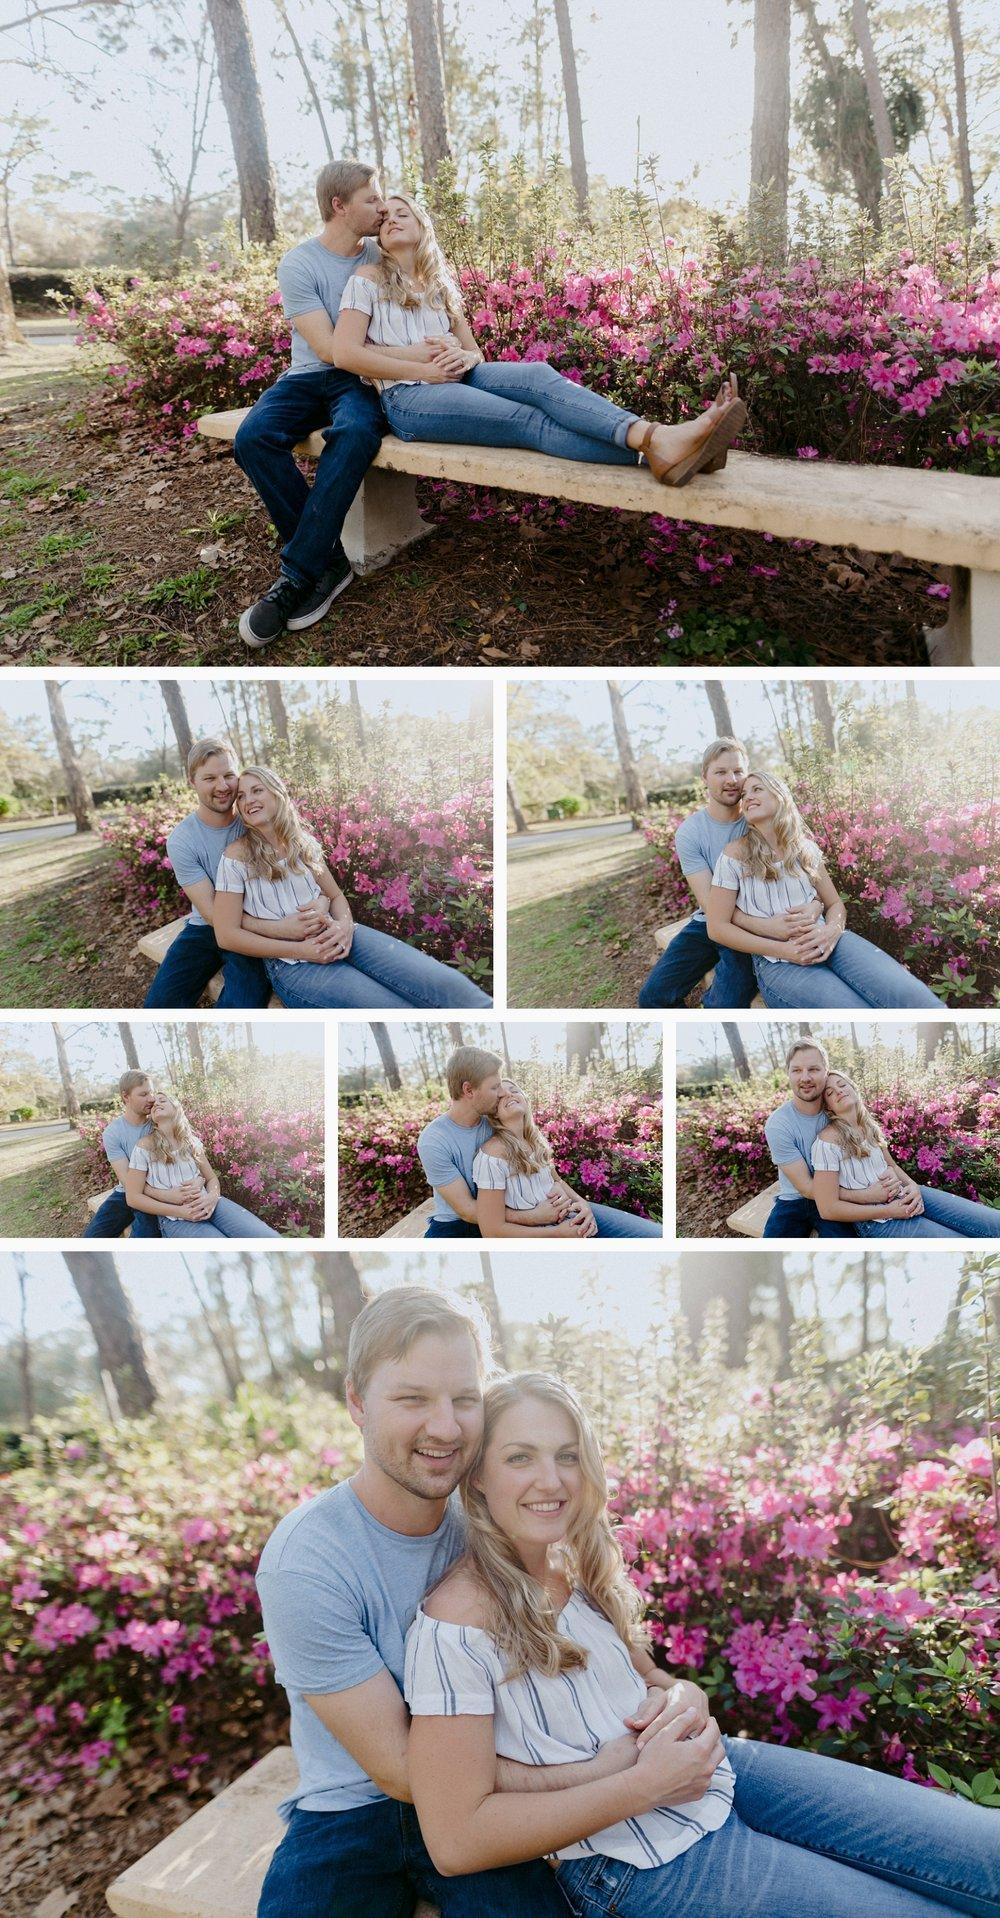 Kylie-And-Jack-Mead-Botanical-Garden-Engagement_0029.jpg